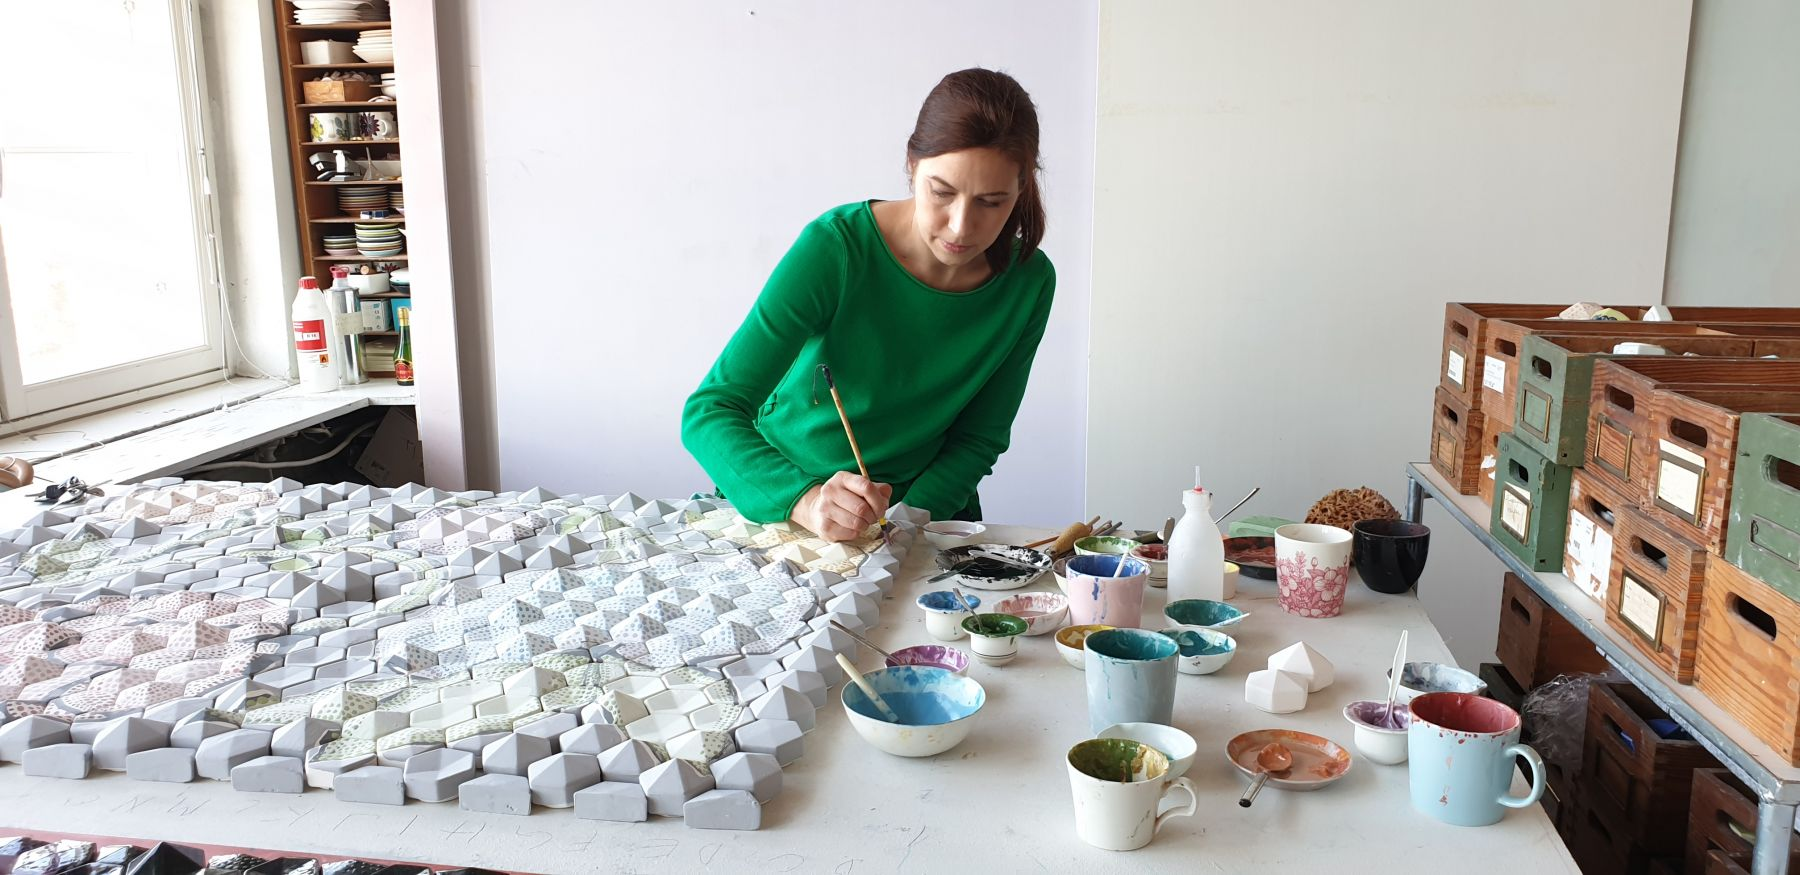 Heini Riitahuhta in the studio